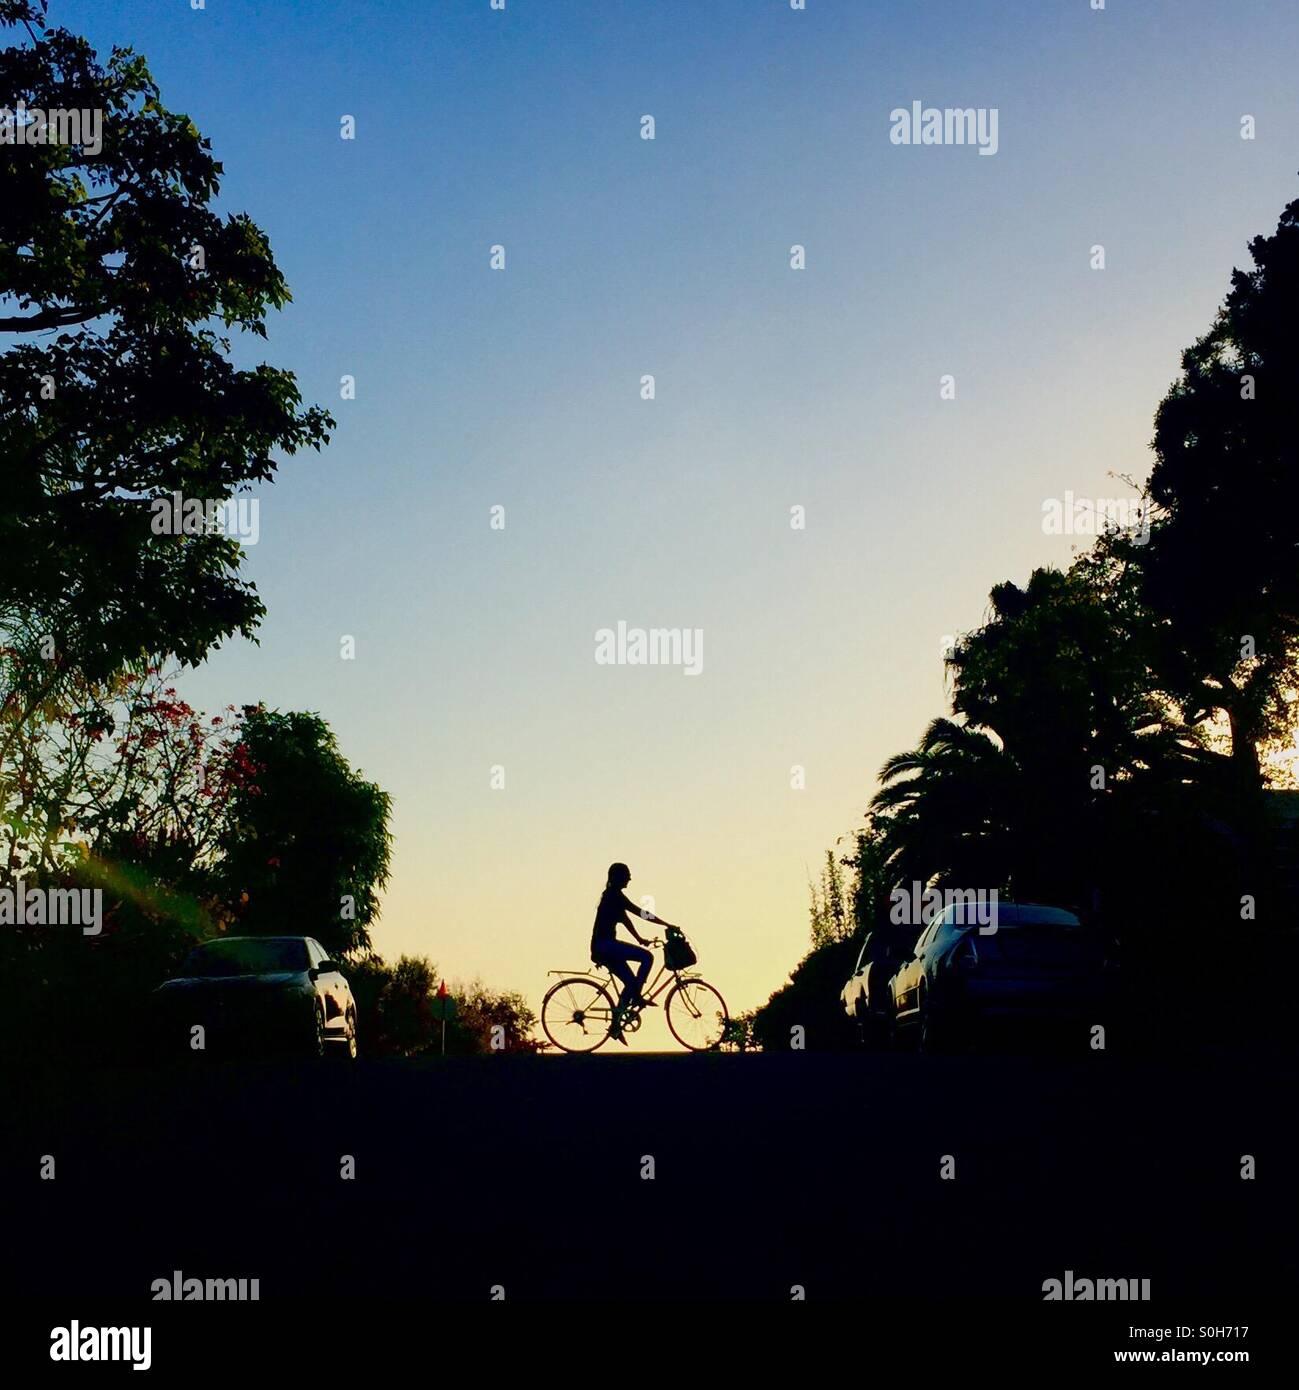 Silueta de una niña de montar bicicletaFoto de stock